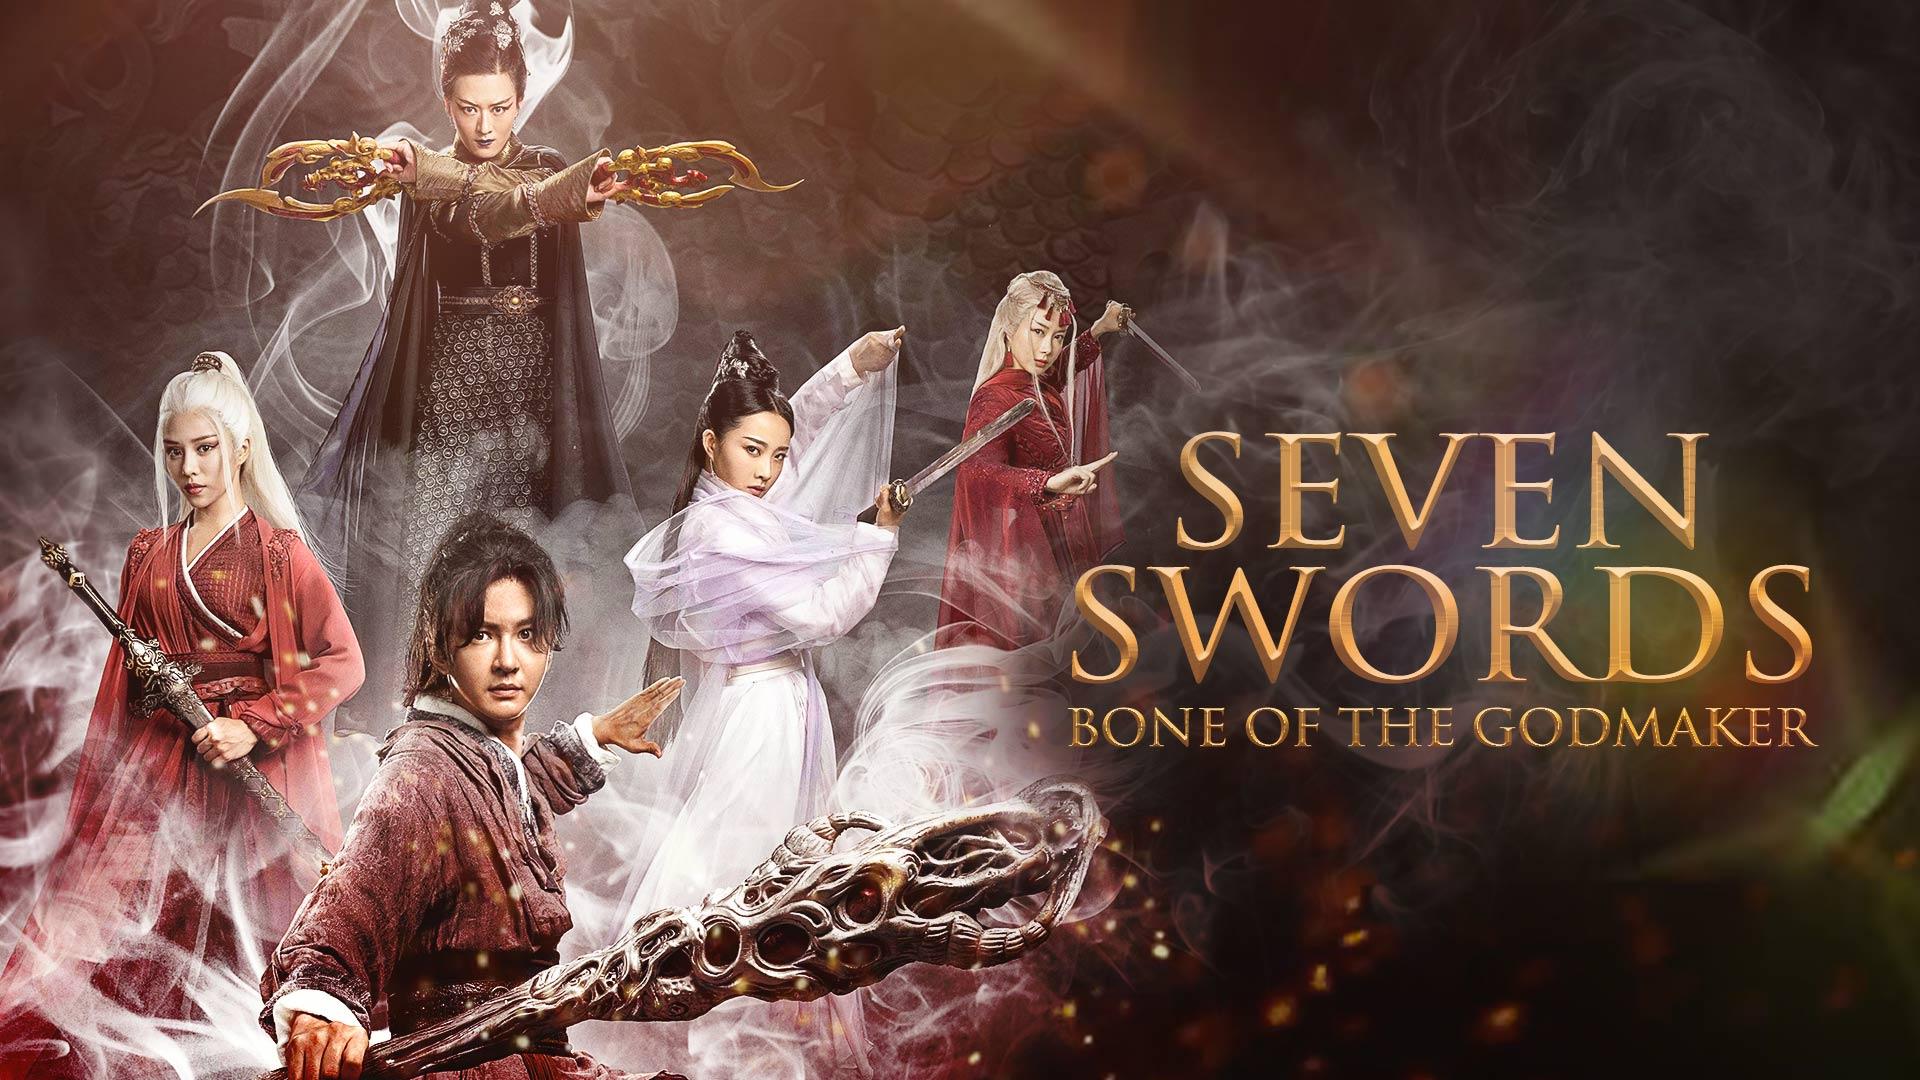 Seven Swords: Bone of the Godmaker